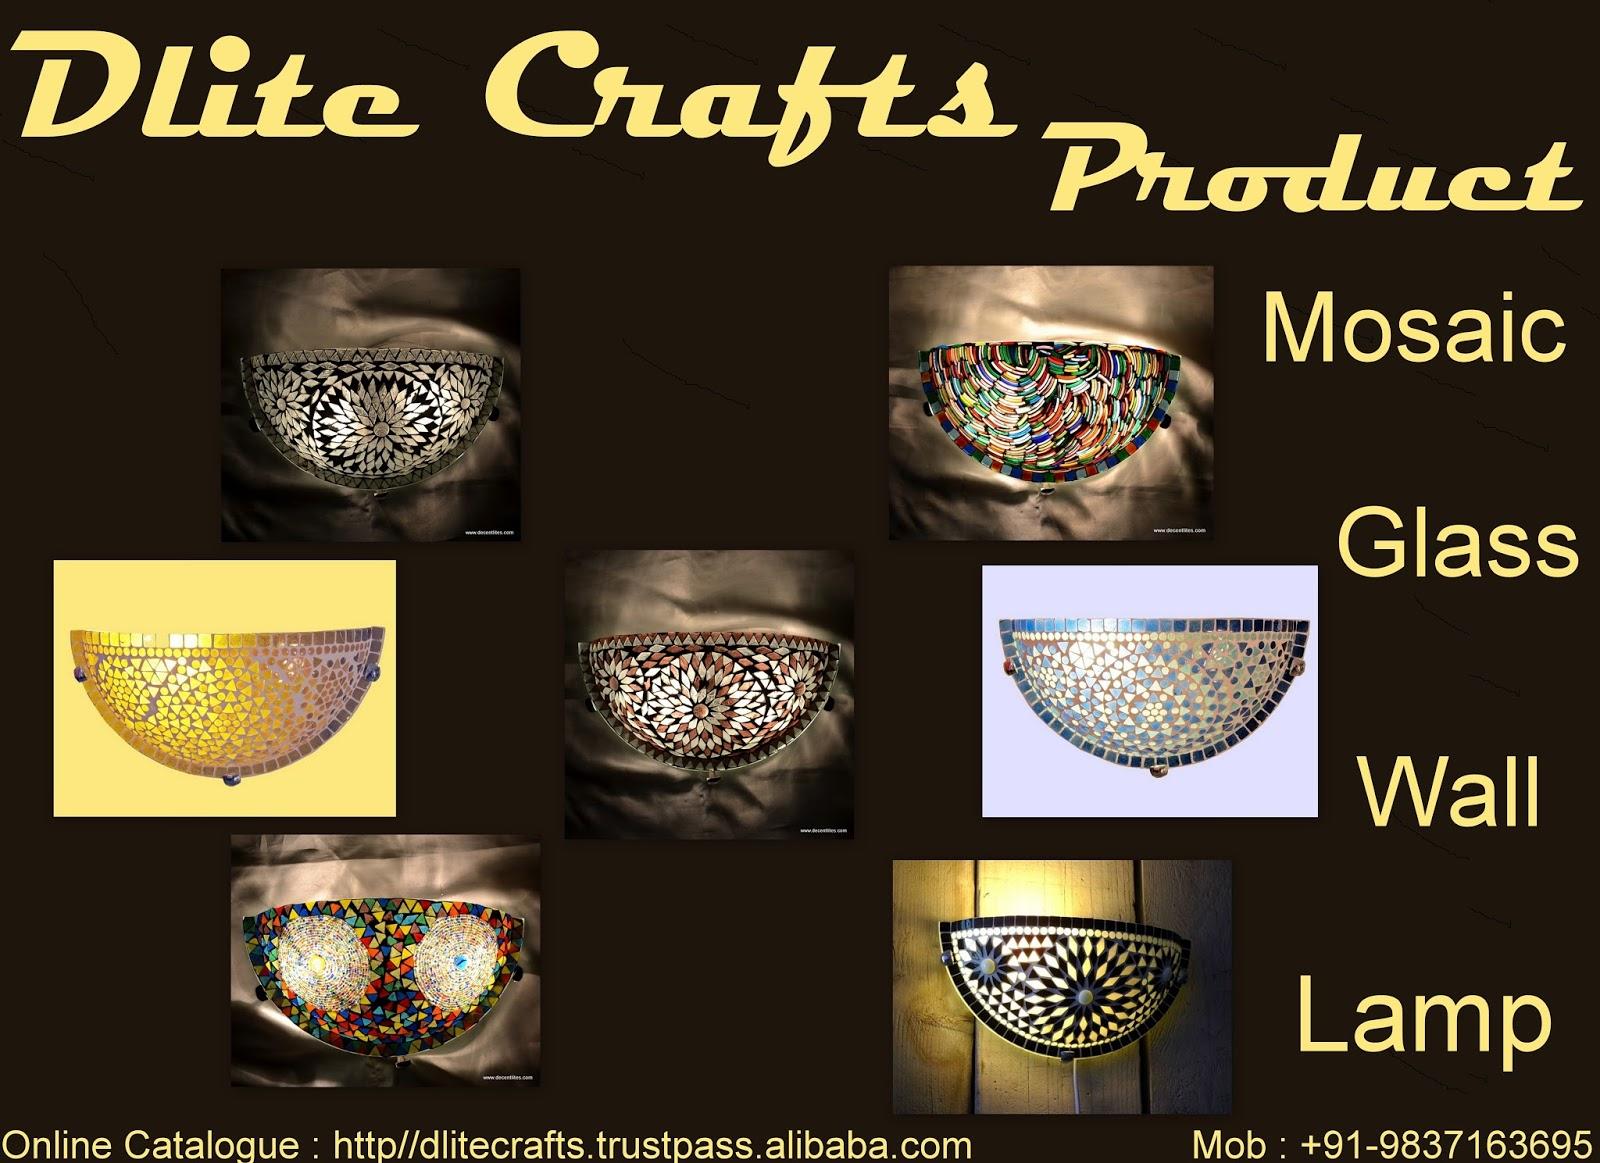 DliteCrafts: Mosaic Glass wall Lamp